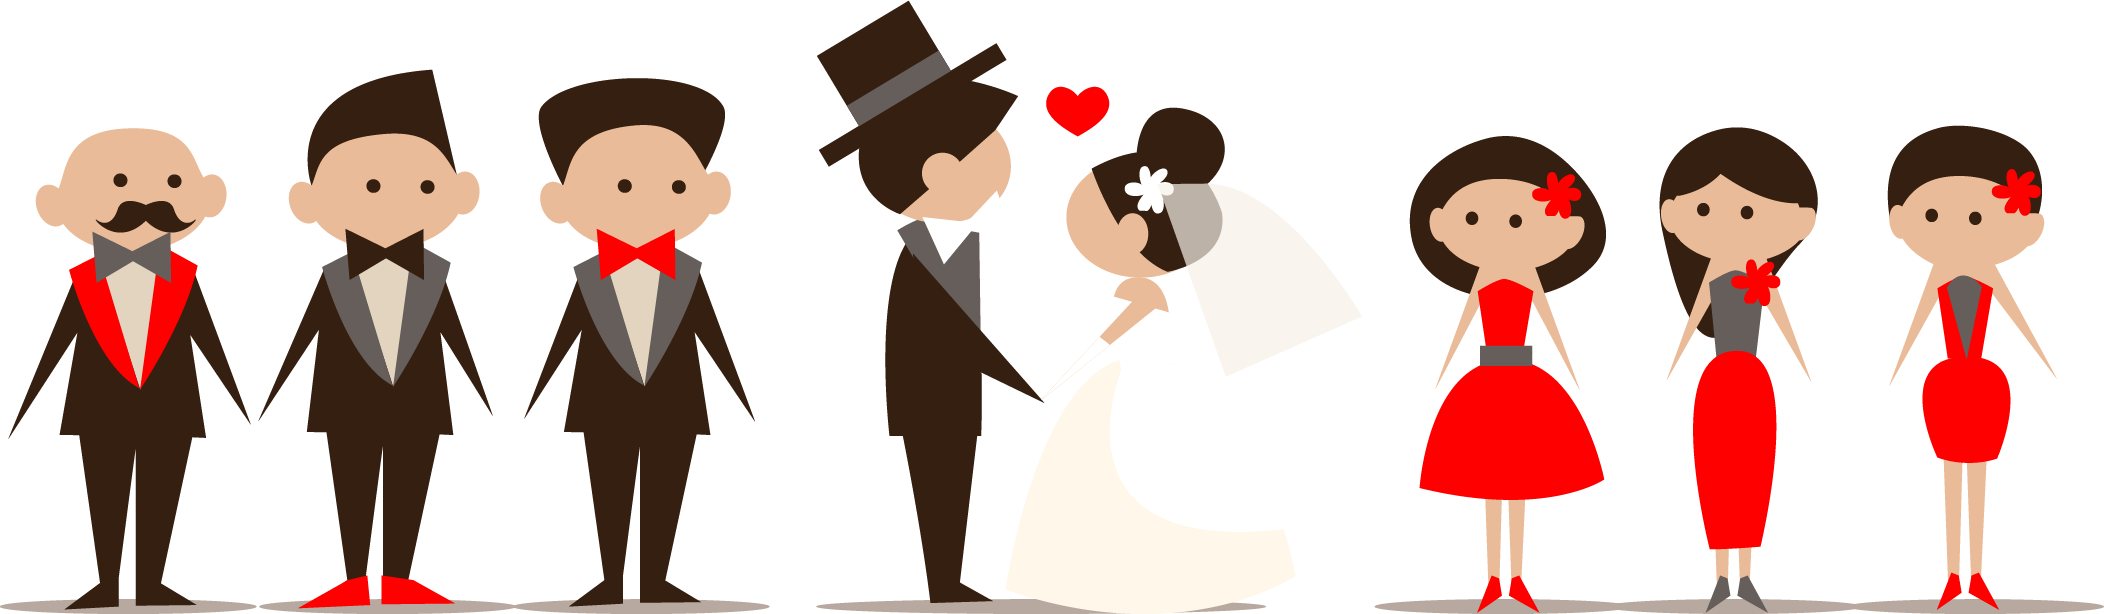 Wedding PNG Transparent Free Images